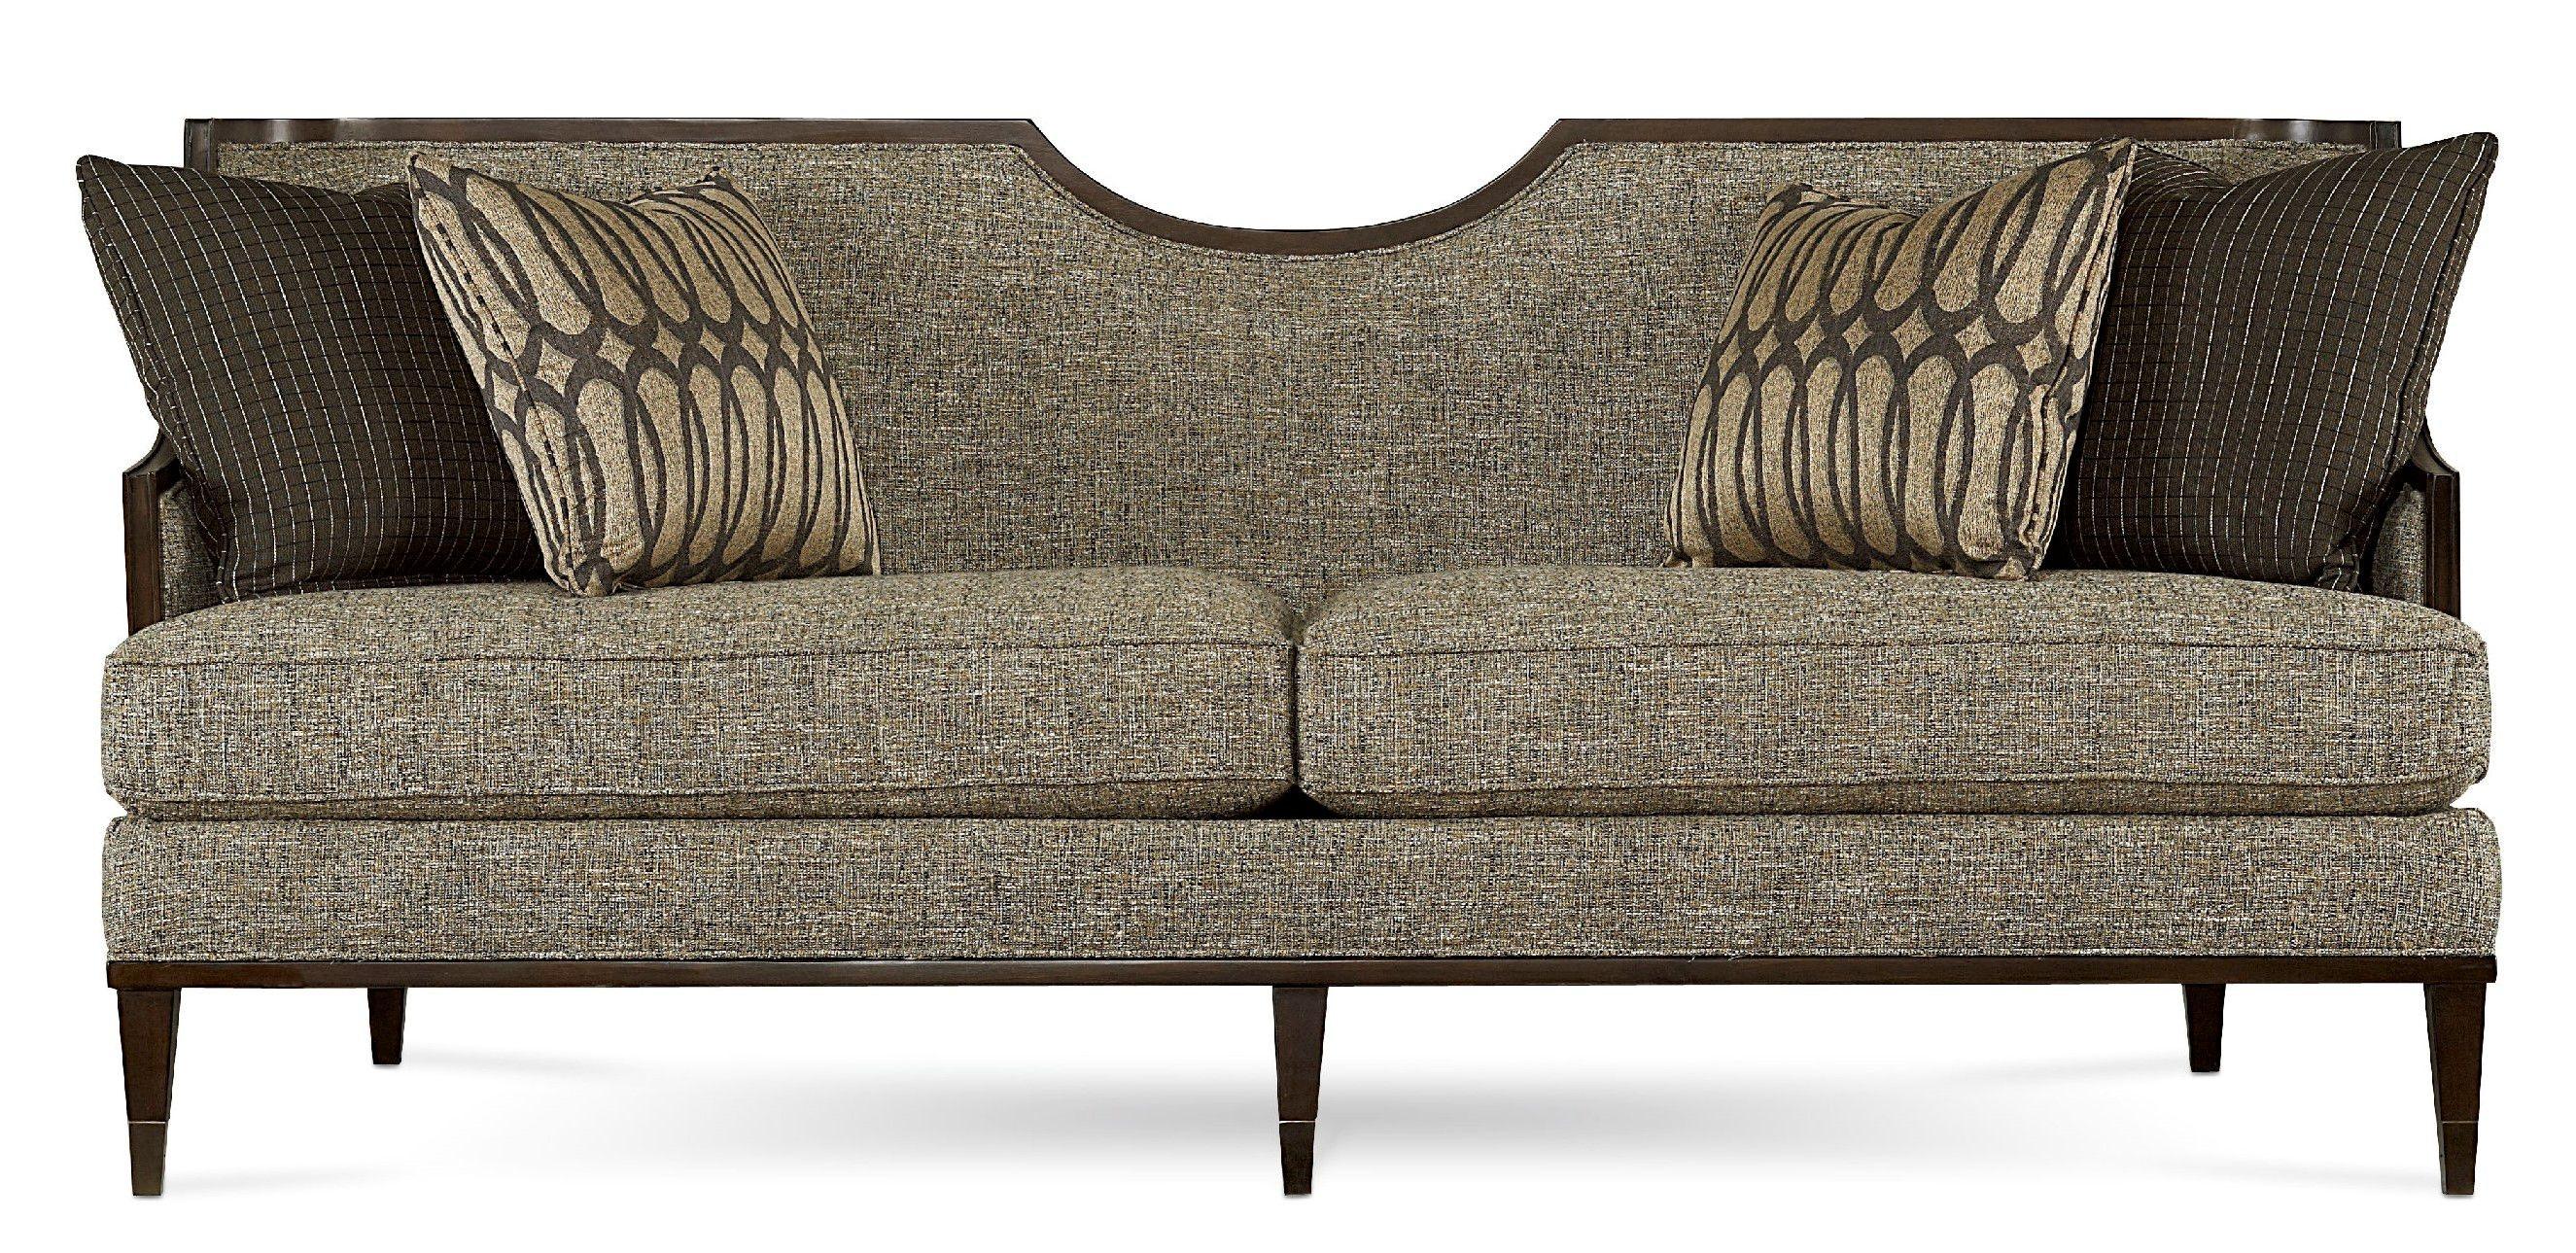 Charming 161501 5036AA. Sofa · Carol House Discount Price $1,347.00